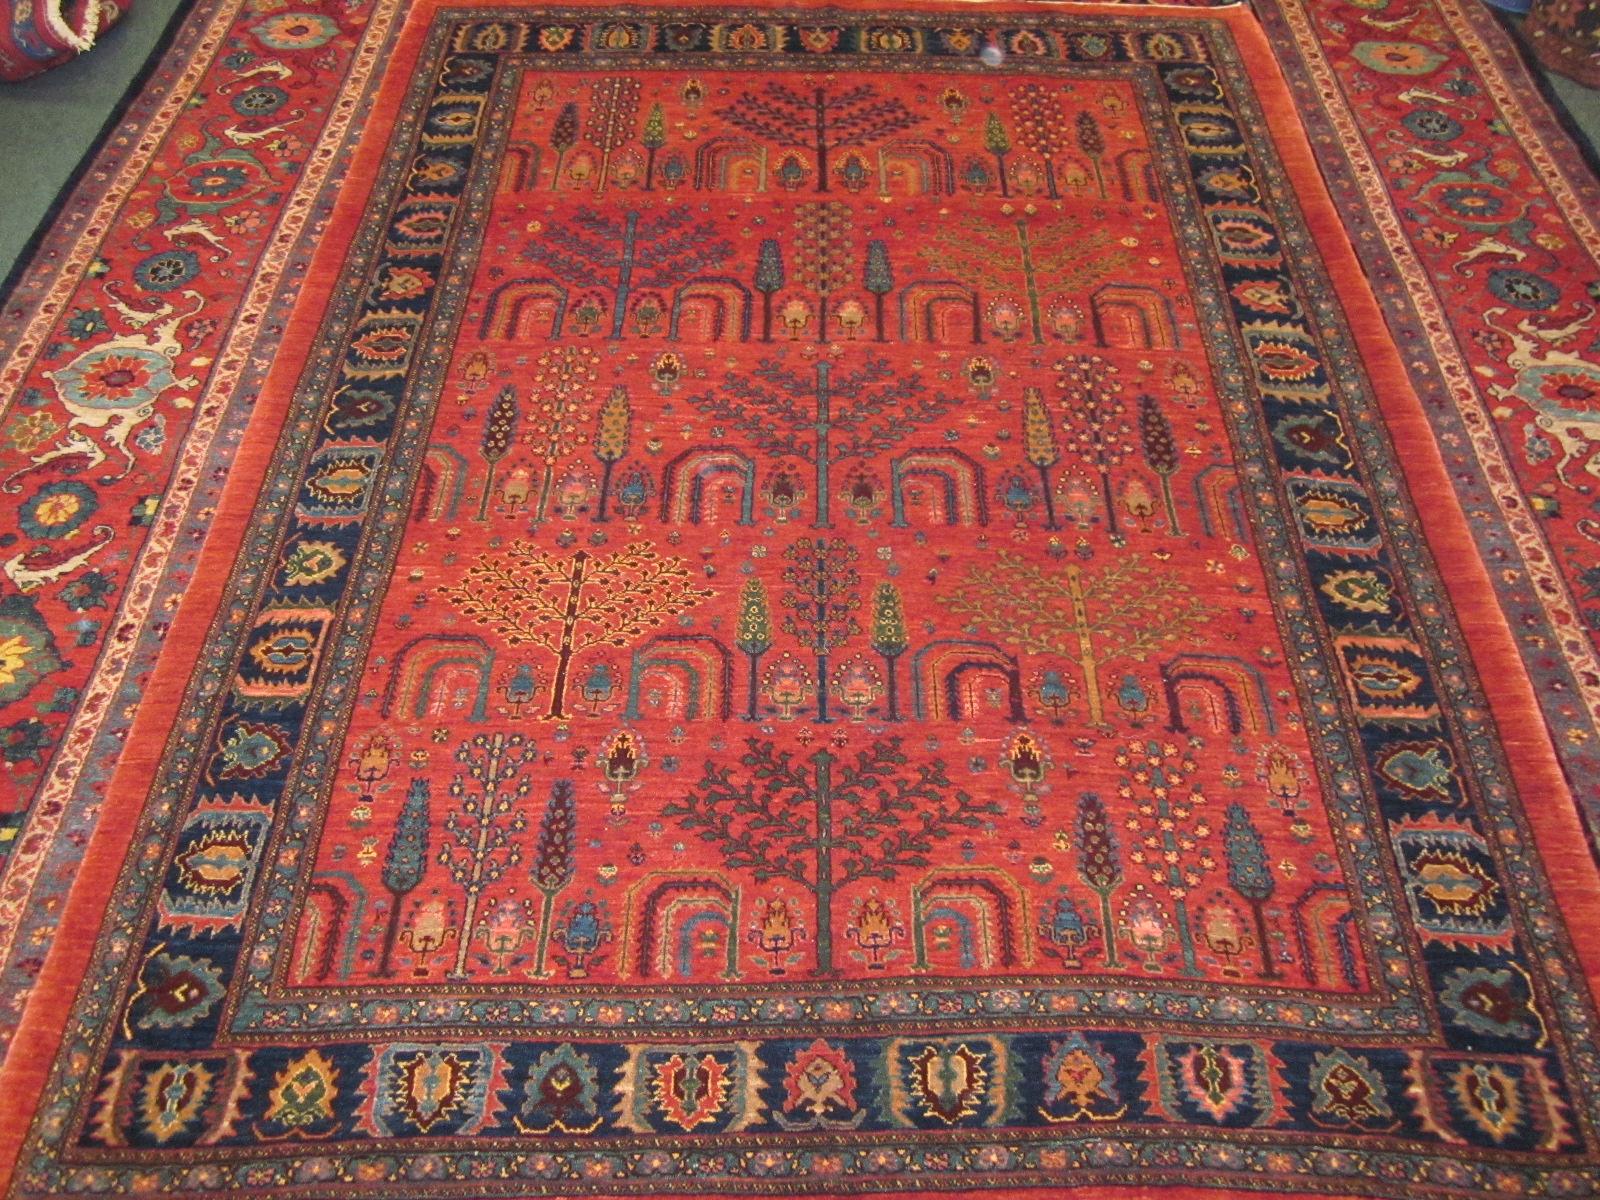 Persian Tribal rug, 6 x 8, Tree of Life design.